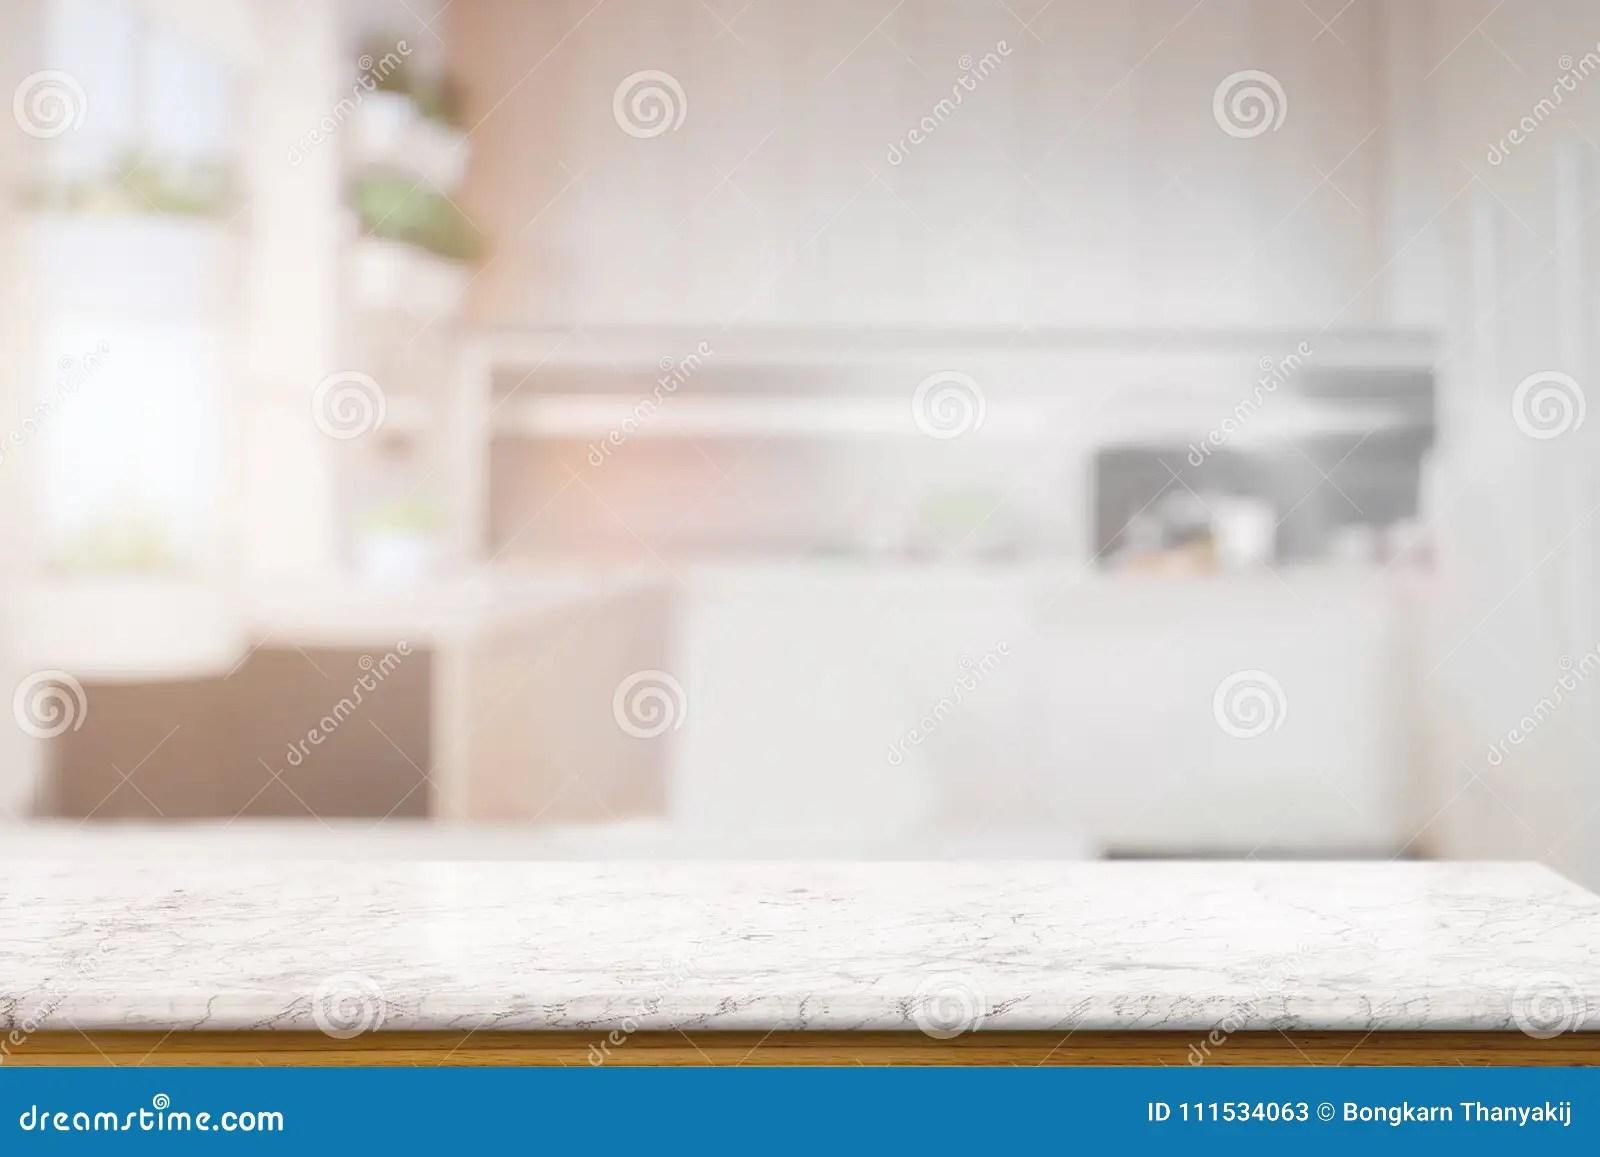 white kitchen bench stainless steel backsplash 在被弄脏的厨房长凳的大理石纹理桌库存图片 图片包括有家具 安排 土气 在厨房背景的被弄脏的图象的白色大理石桌